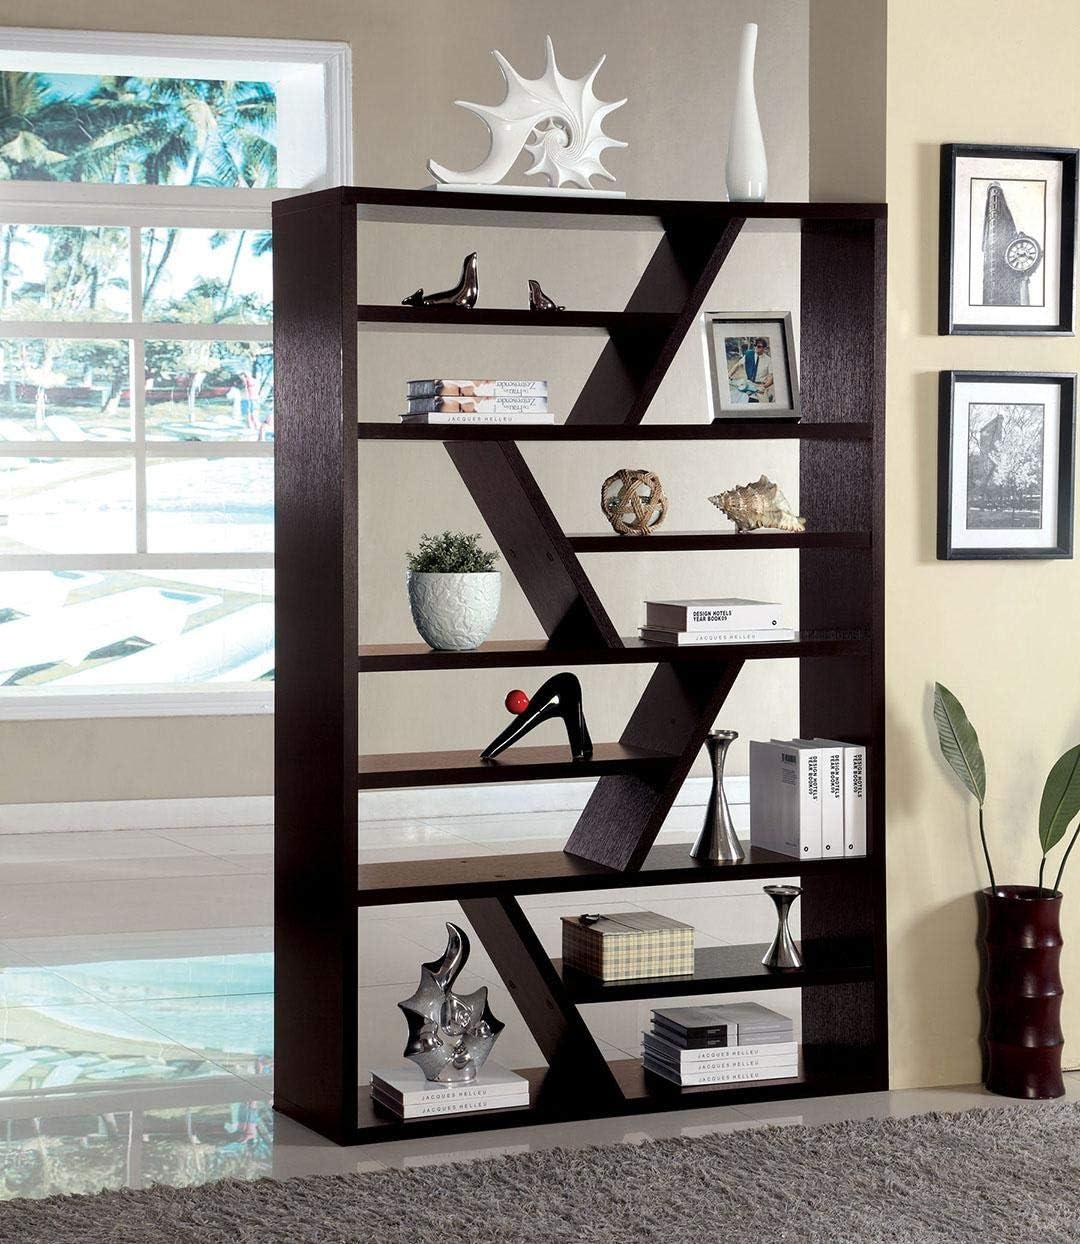 Furniture of America Kamloo Display Shelf, Espresso